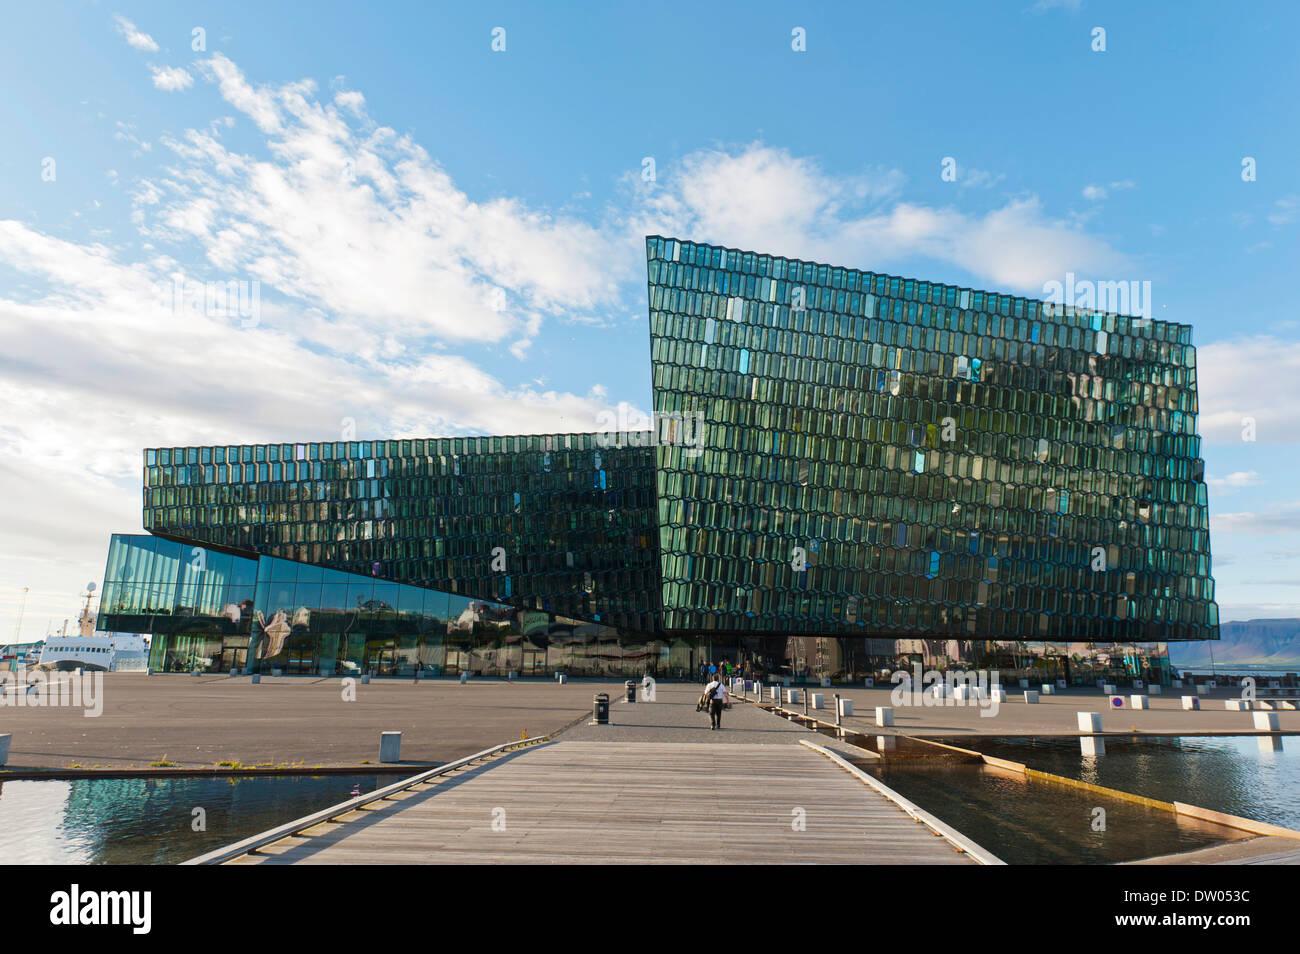 Harpa Concert Hall, la arquitectura moderna de vidrio, Reikiavik, Islandia Imagen De Stock